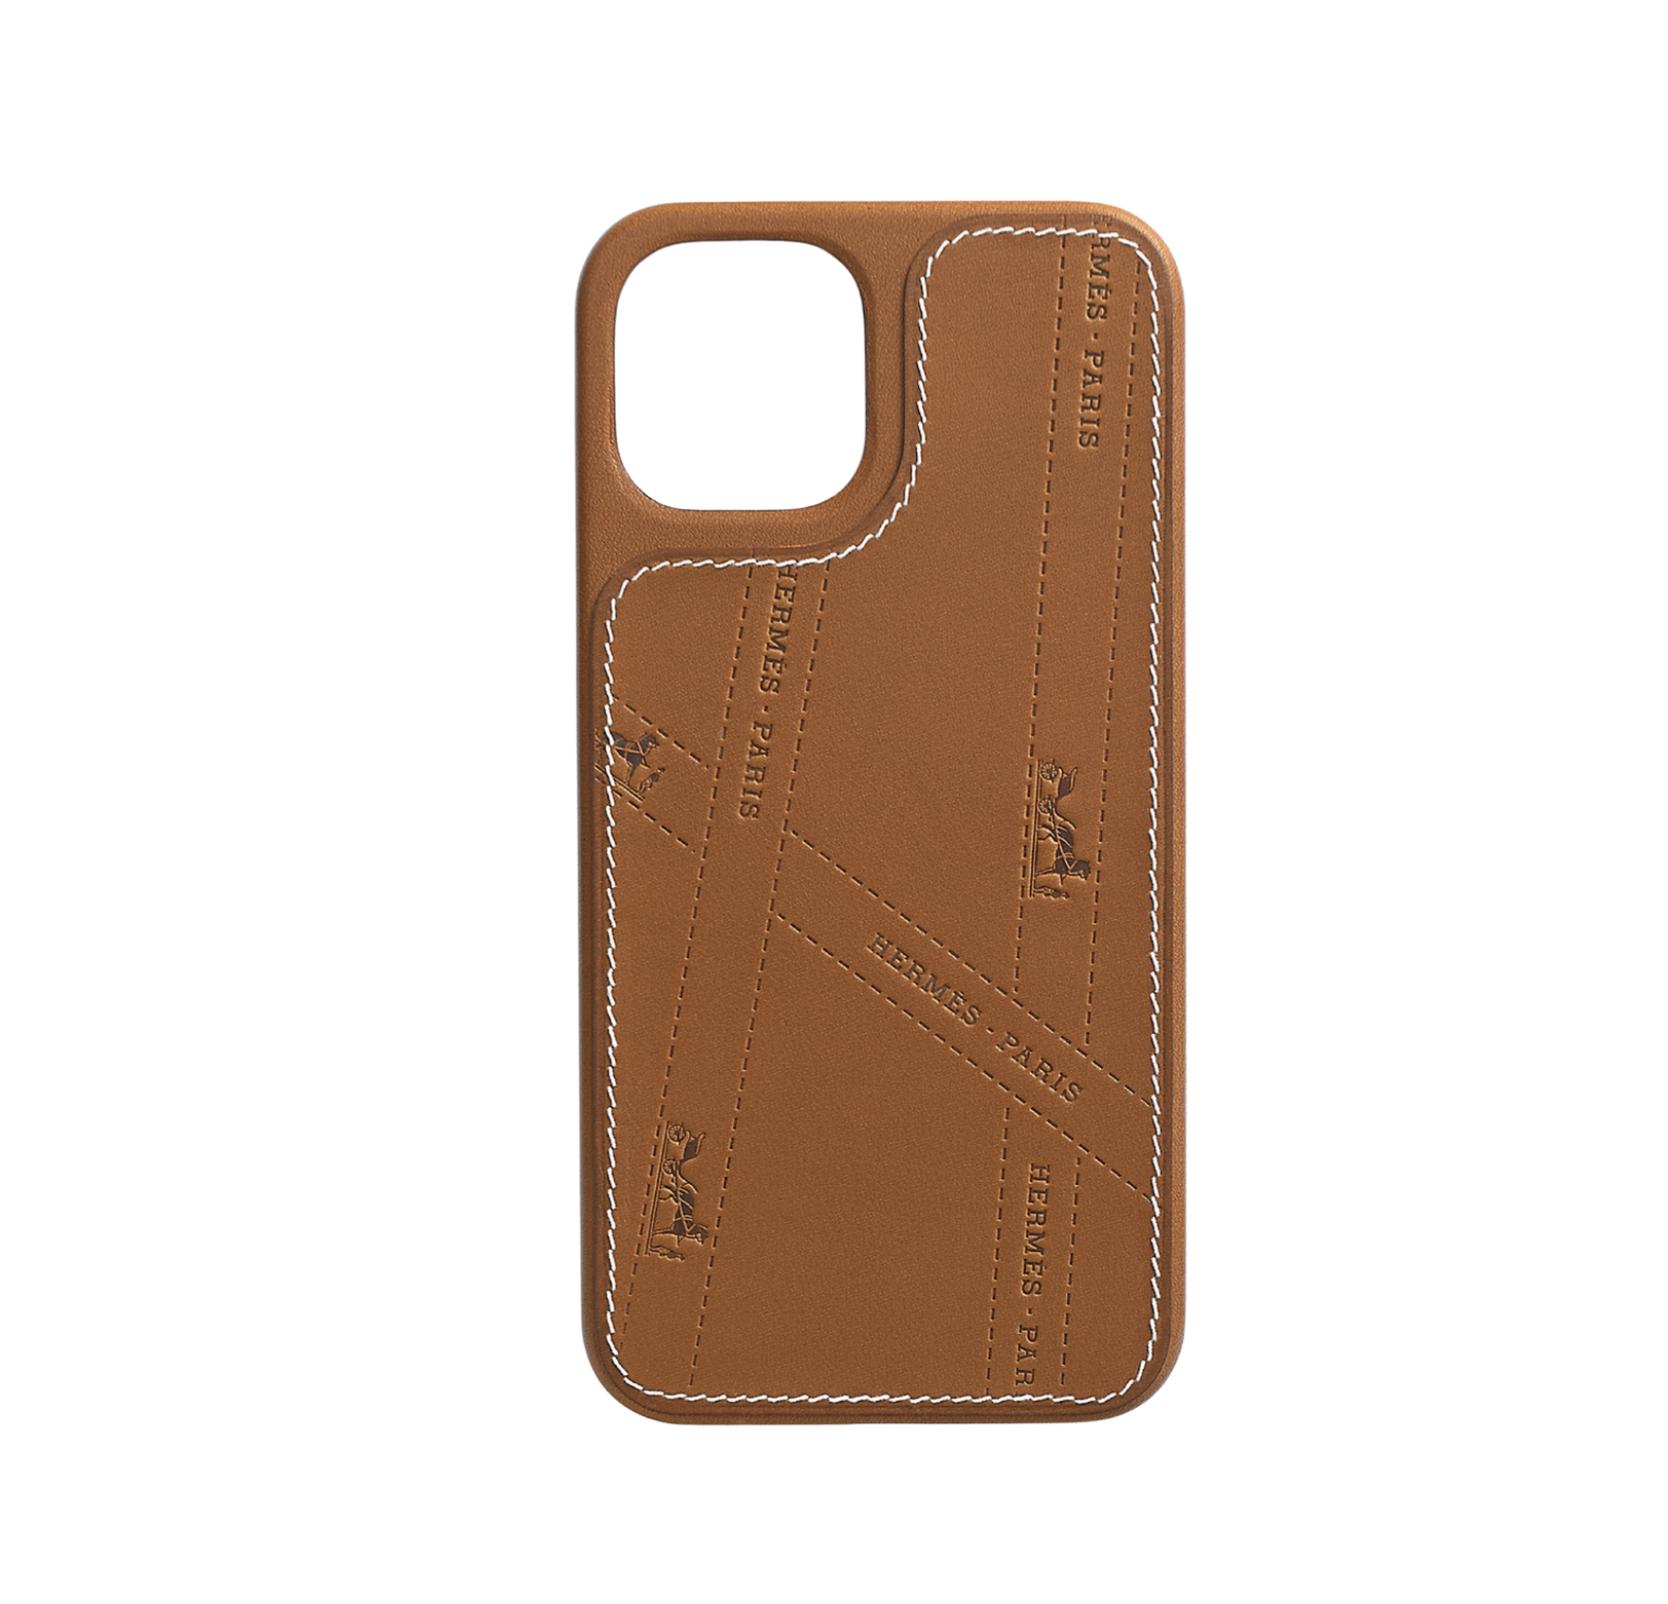 hermes-leather-phone-case-designer-iPhone-12-Pro-Max